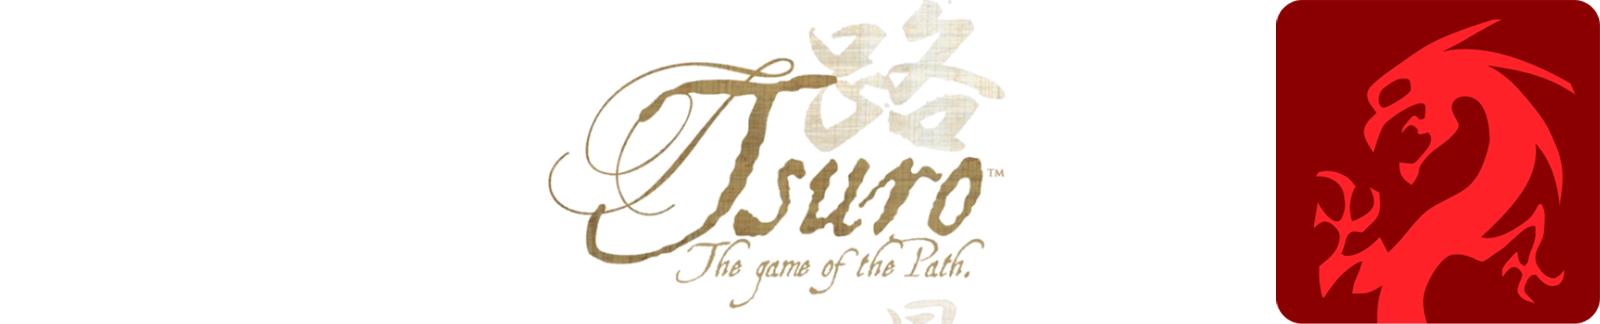 Tsuro App Review